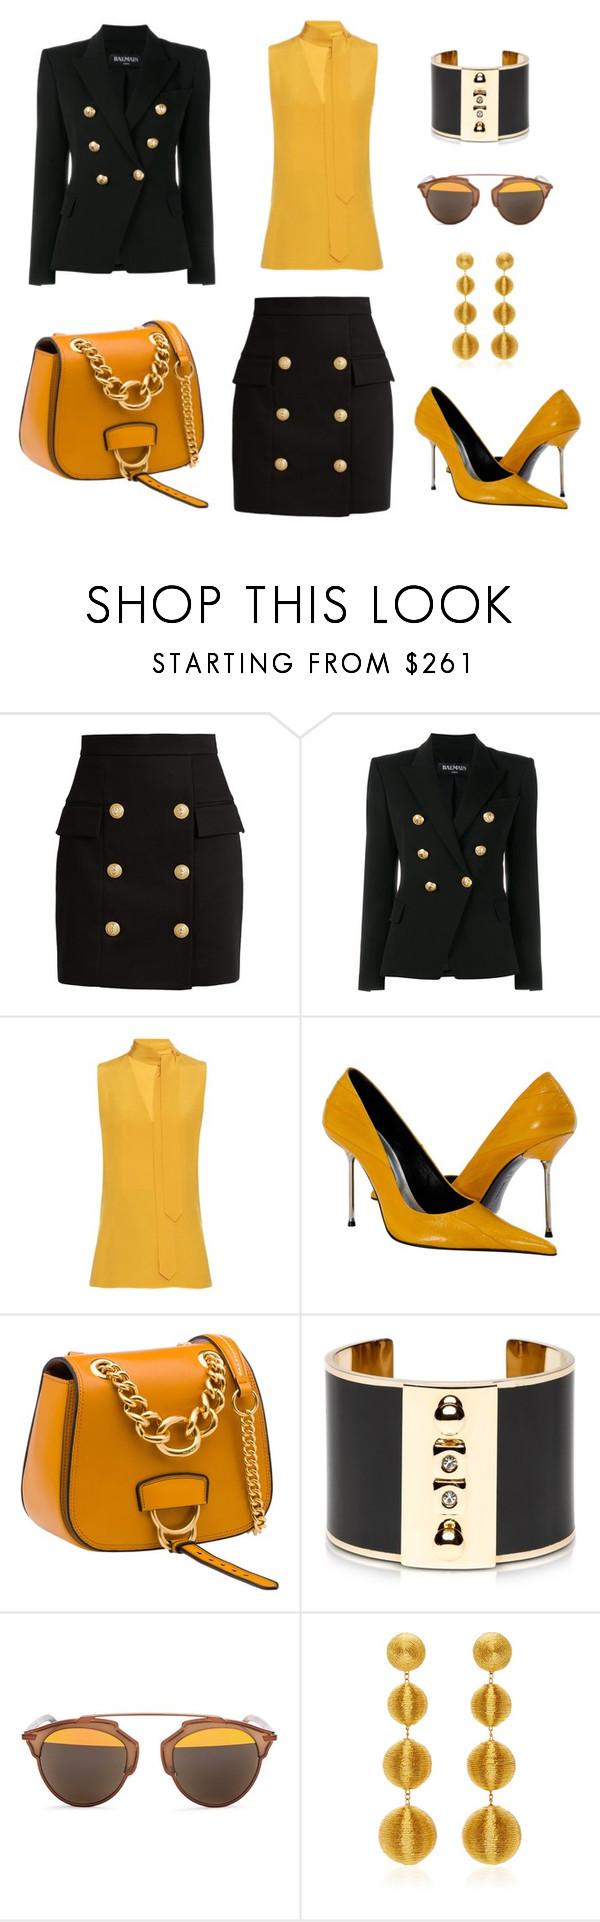 """CEO"" by holgal ❤ liked on Polyvore featuring Balmain, Edun, Miu Miu, Pluma, Christian Dior and Rebecca de Ravenel"